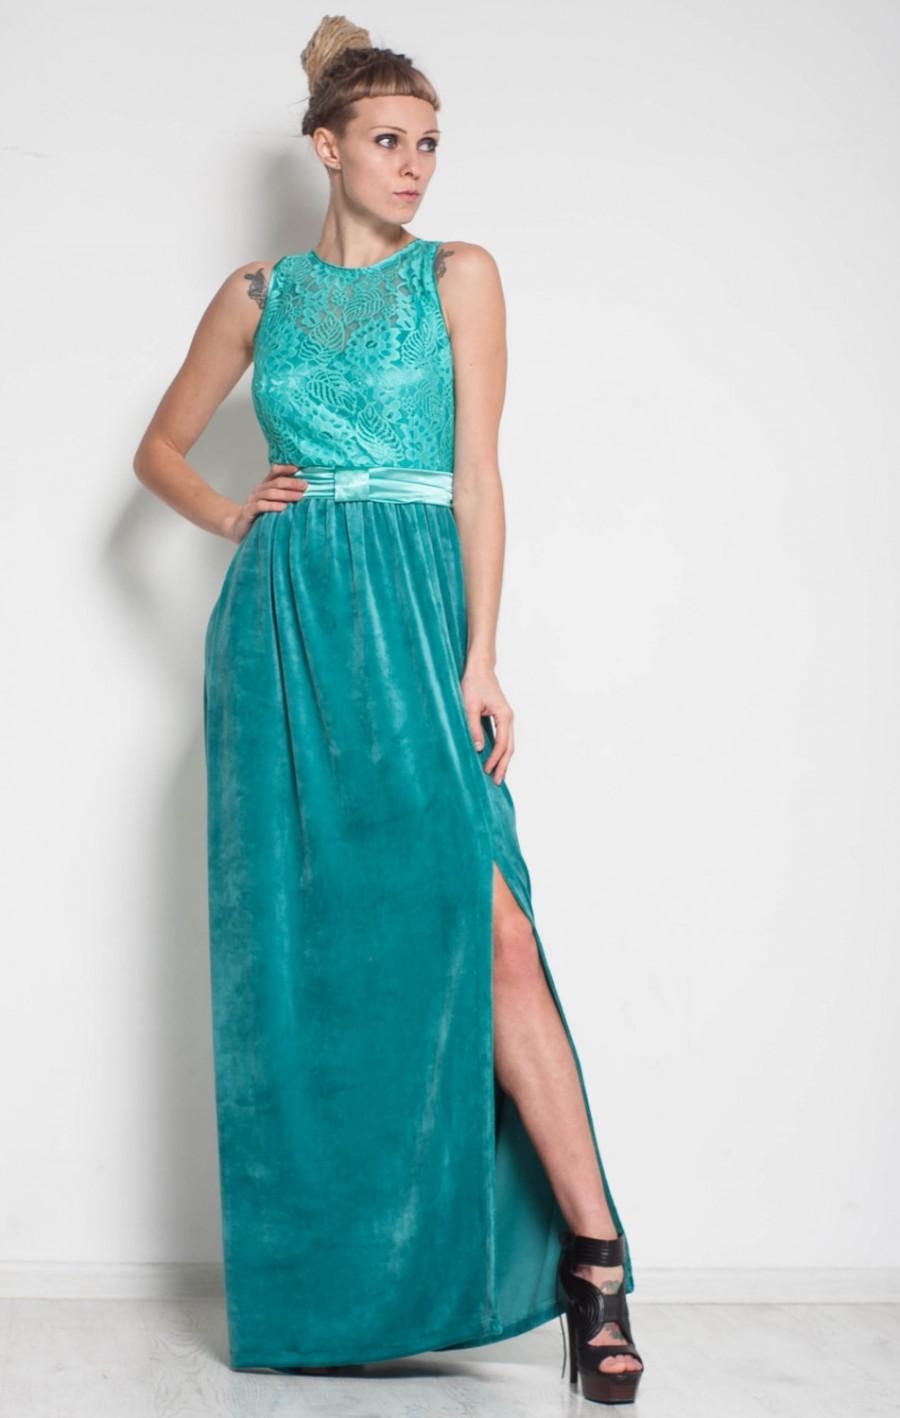 Свадьба - Mint prom dress Maxi formal dress evening velvet split dress cocktail lace floor dress bridesmaid sleeveless guipure dress mint prom dress